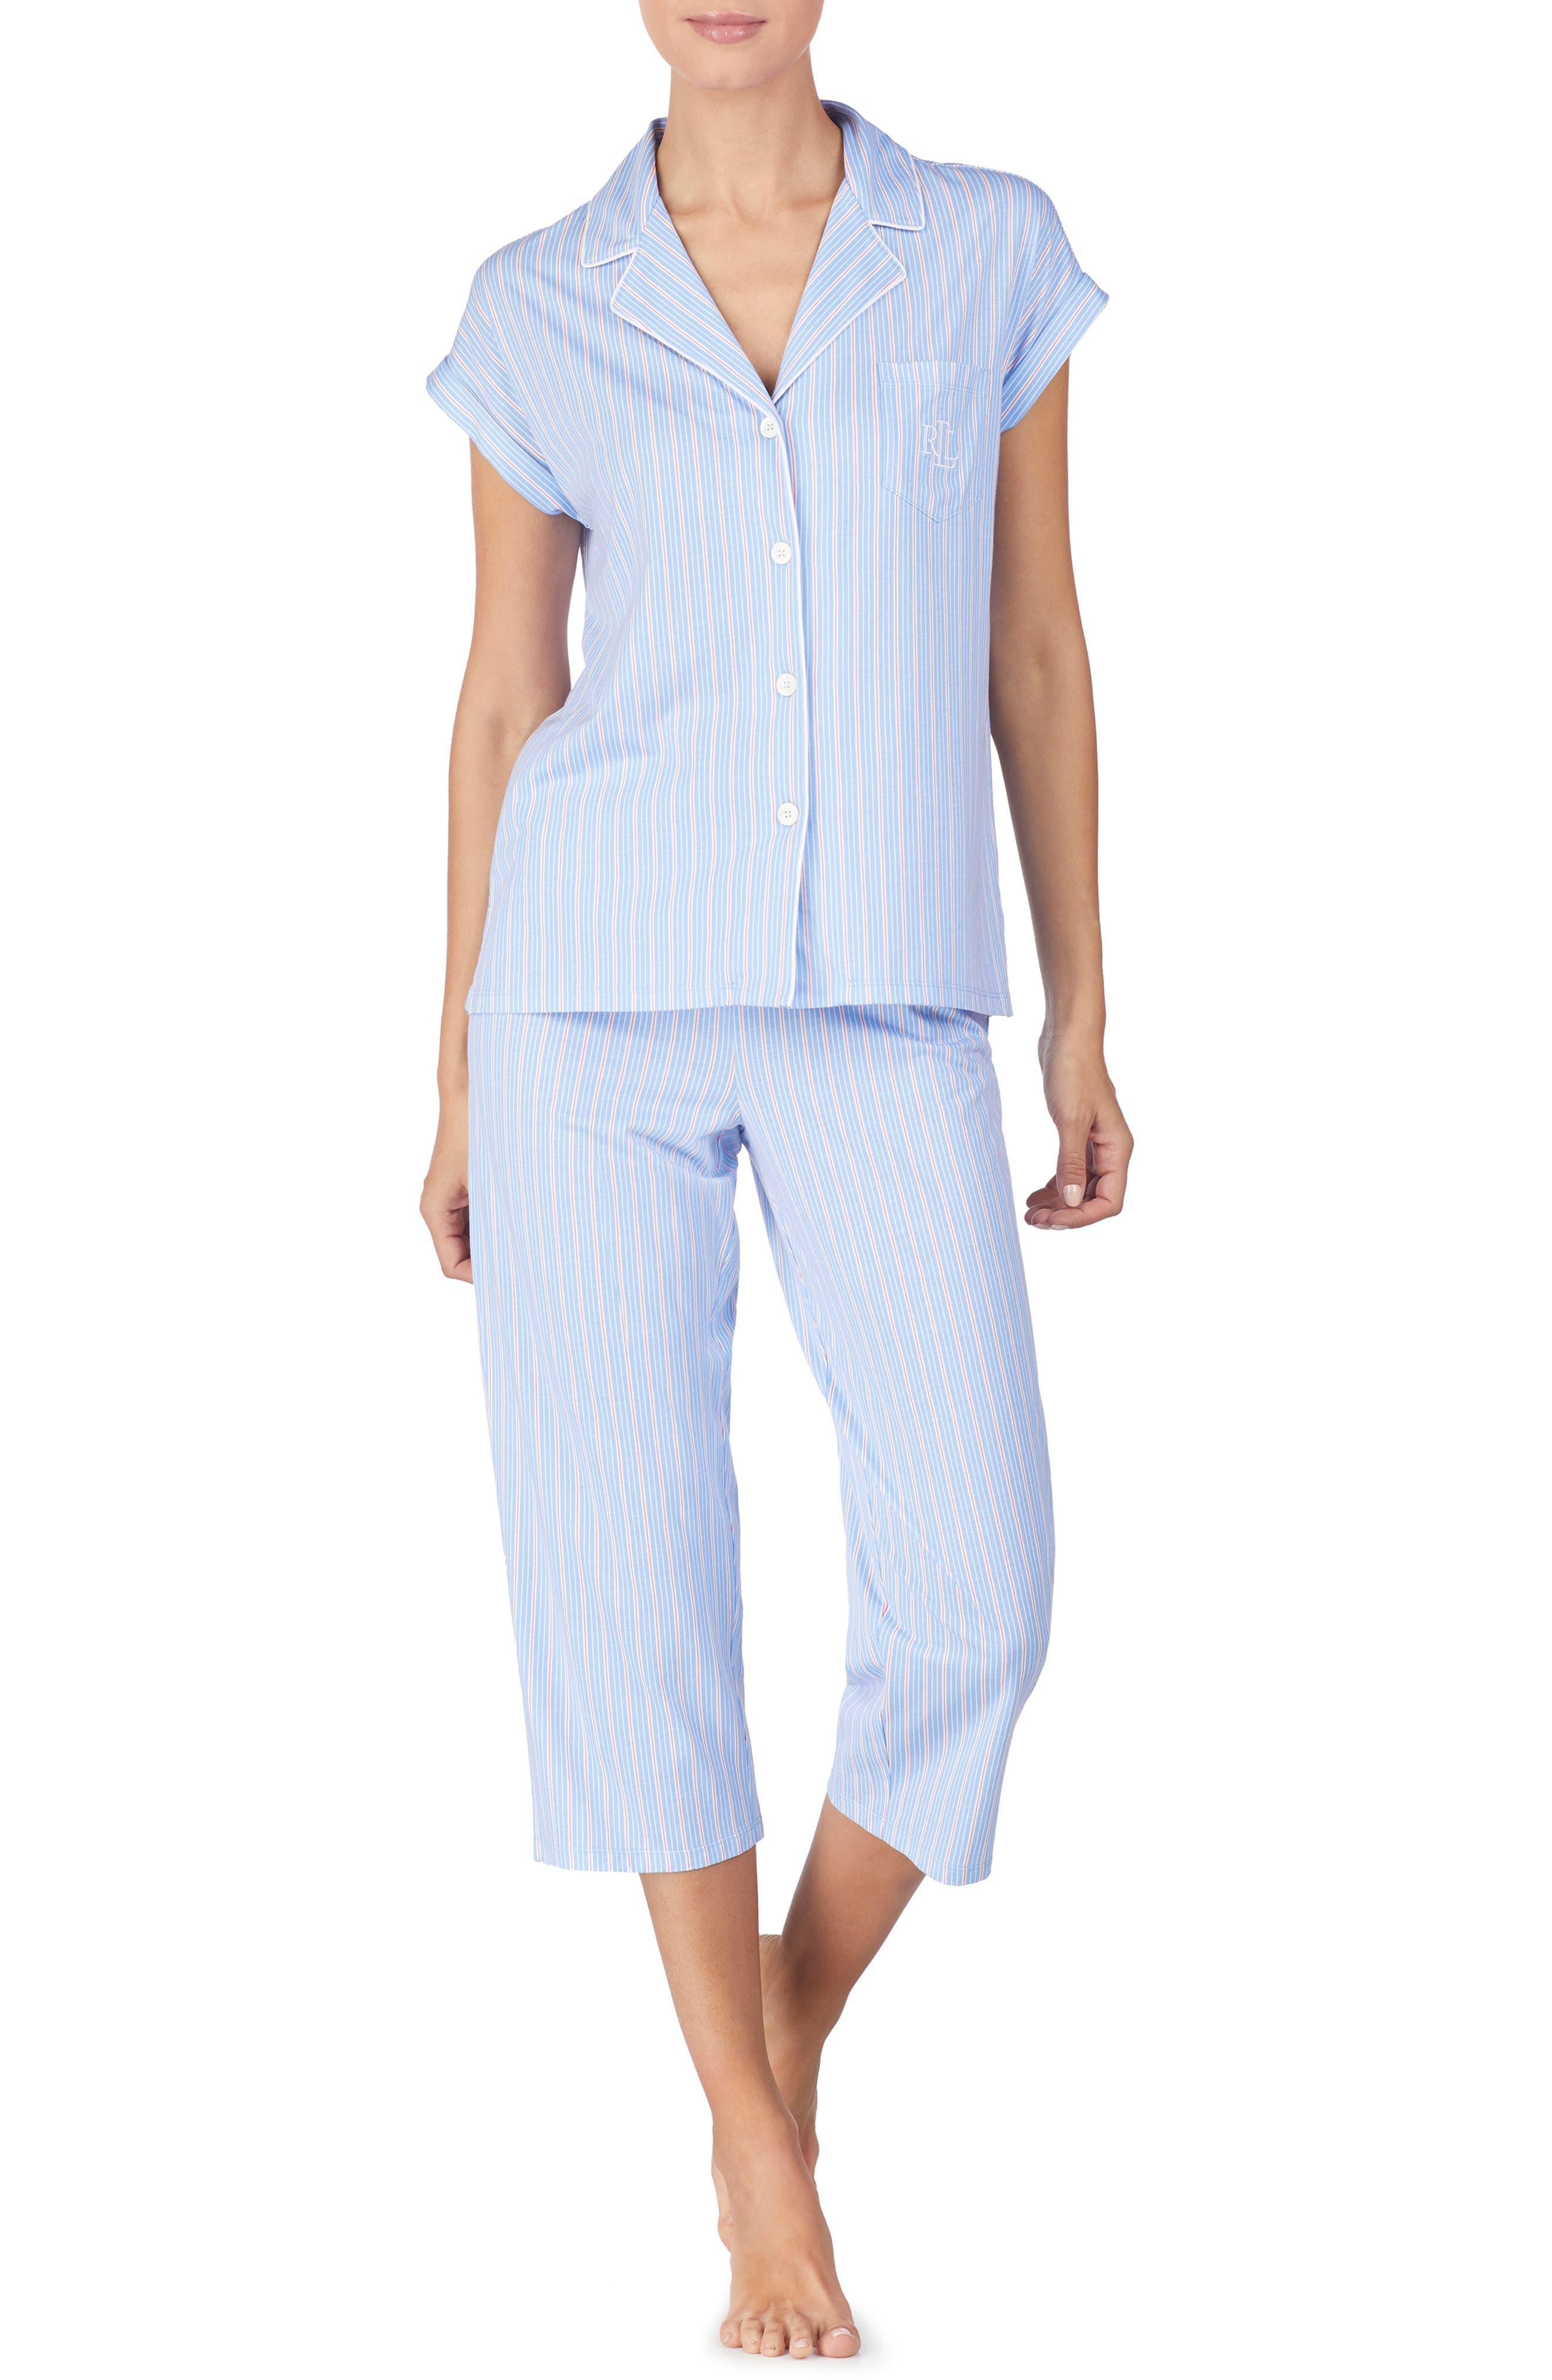 LAUREN RALPH LAUREN Capri Pajamas, Main, color, BLUE STRIPE